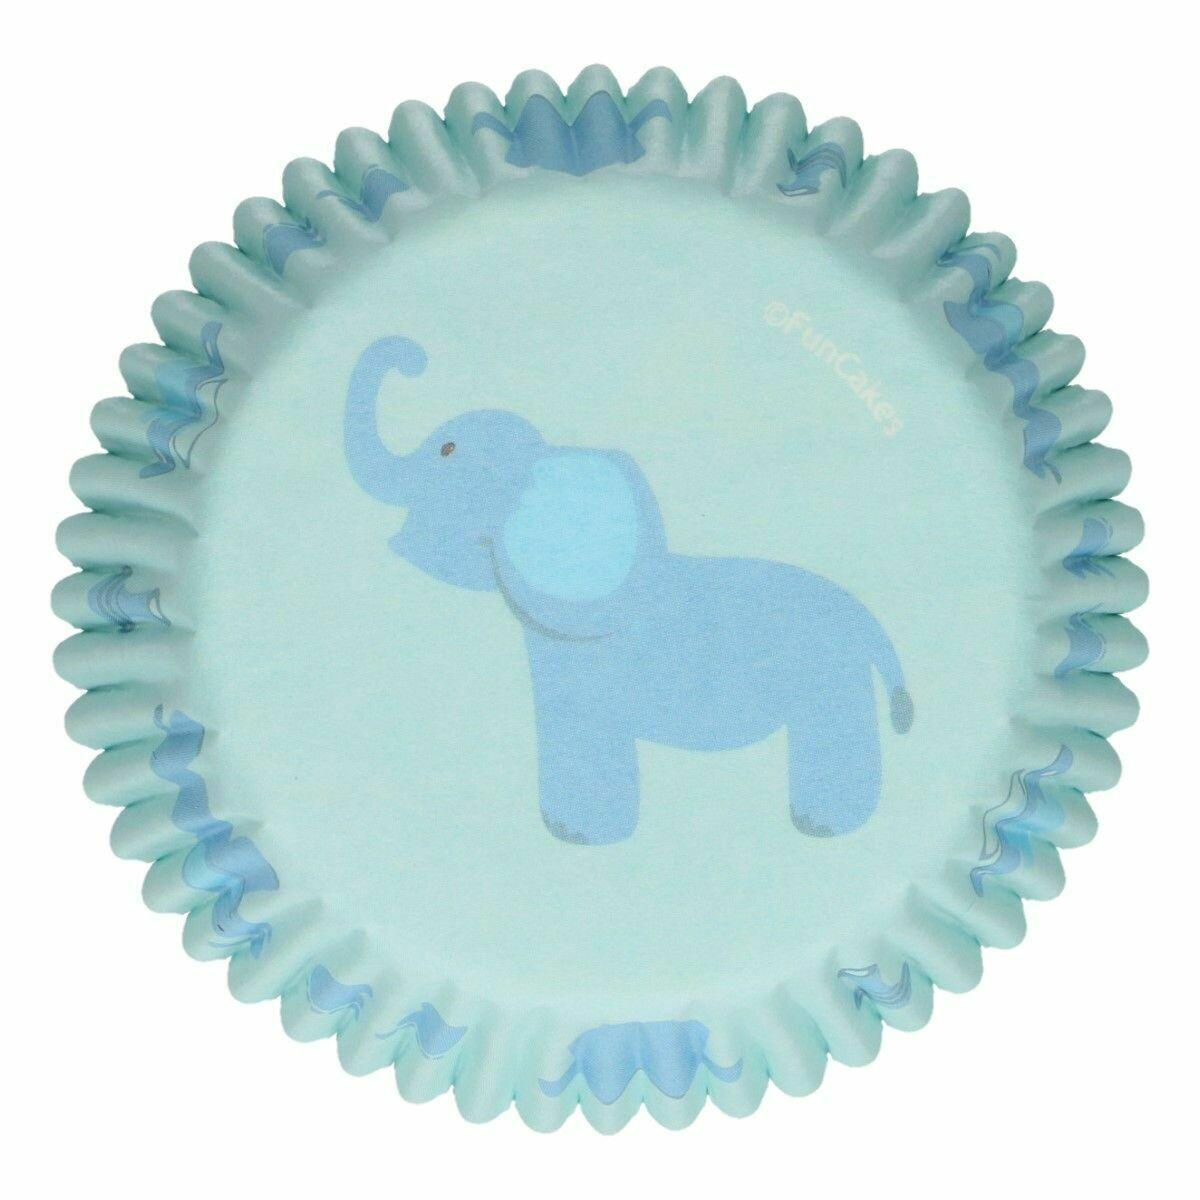 SALE!!! FunCakes Cupcake Cases -BABY ΒΟΥ -Θήκες Ψησίματος -Αγορίστικο Σχέδιο -48 τεμ